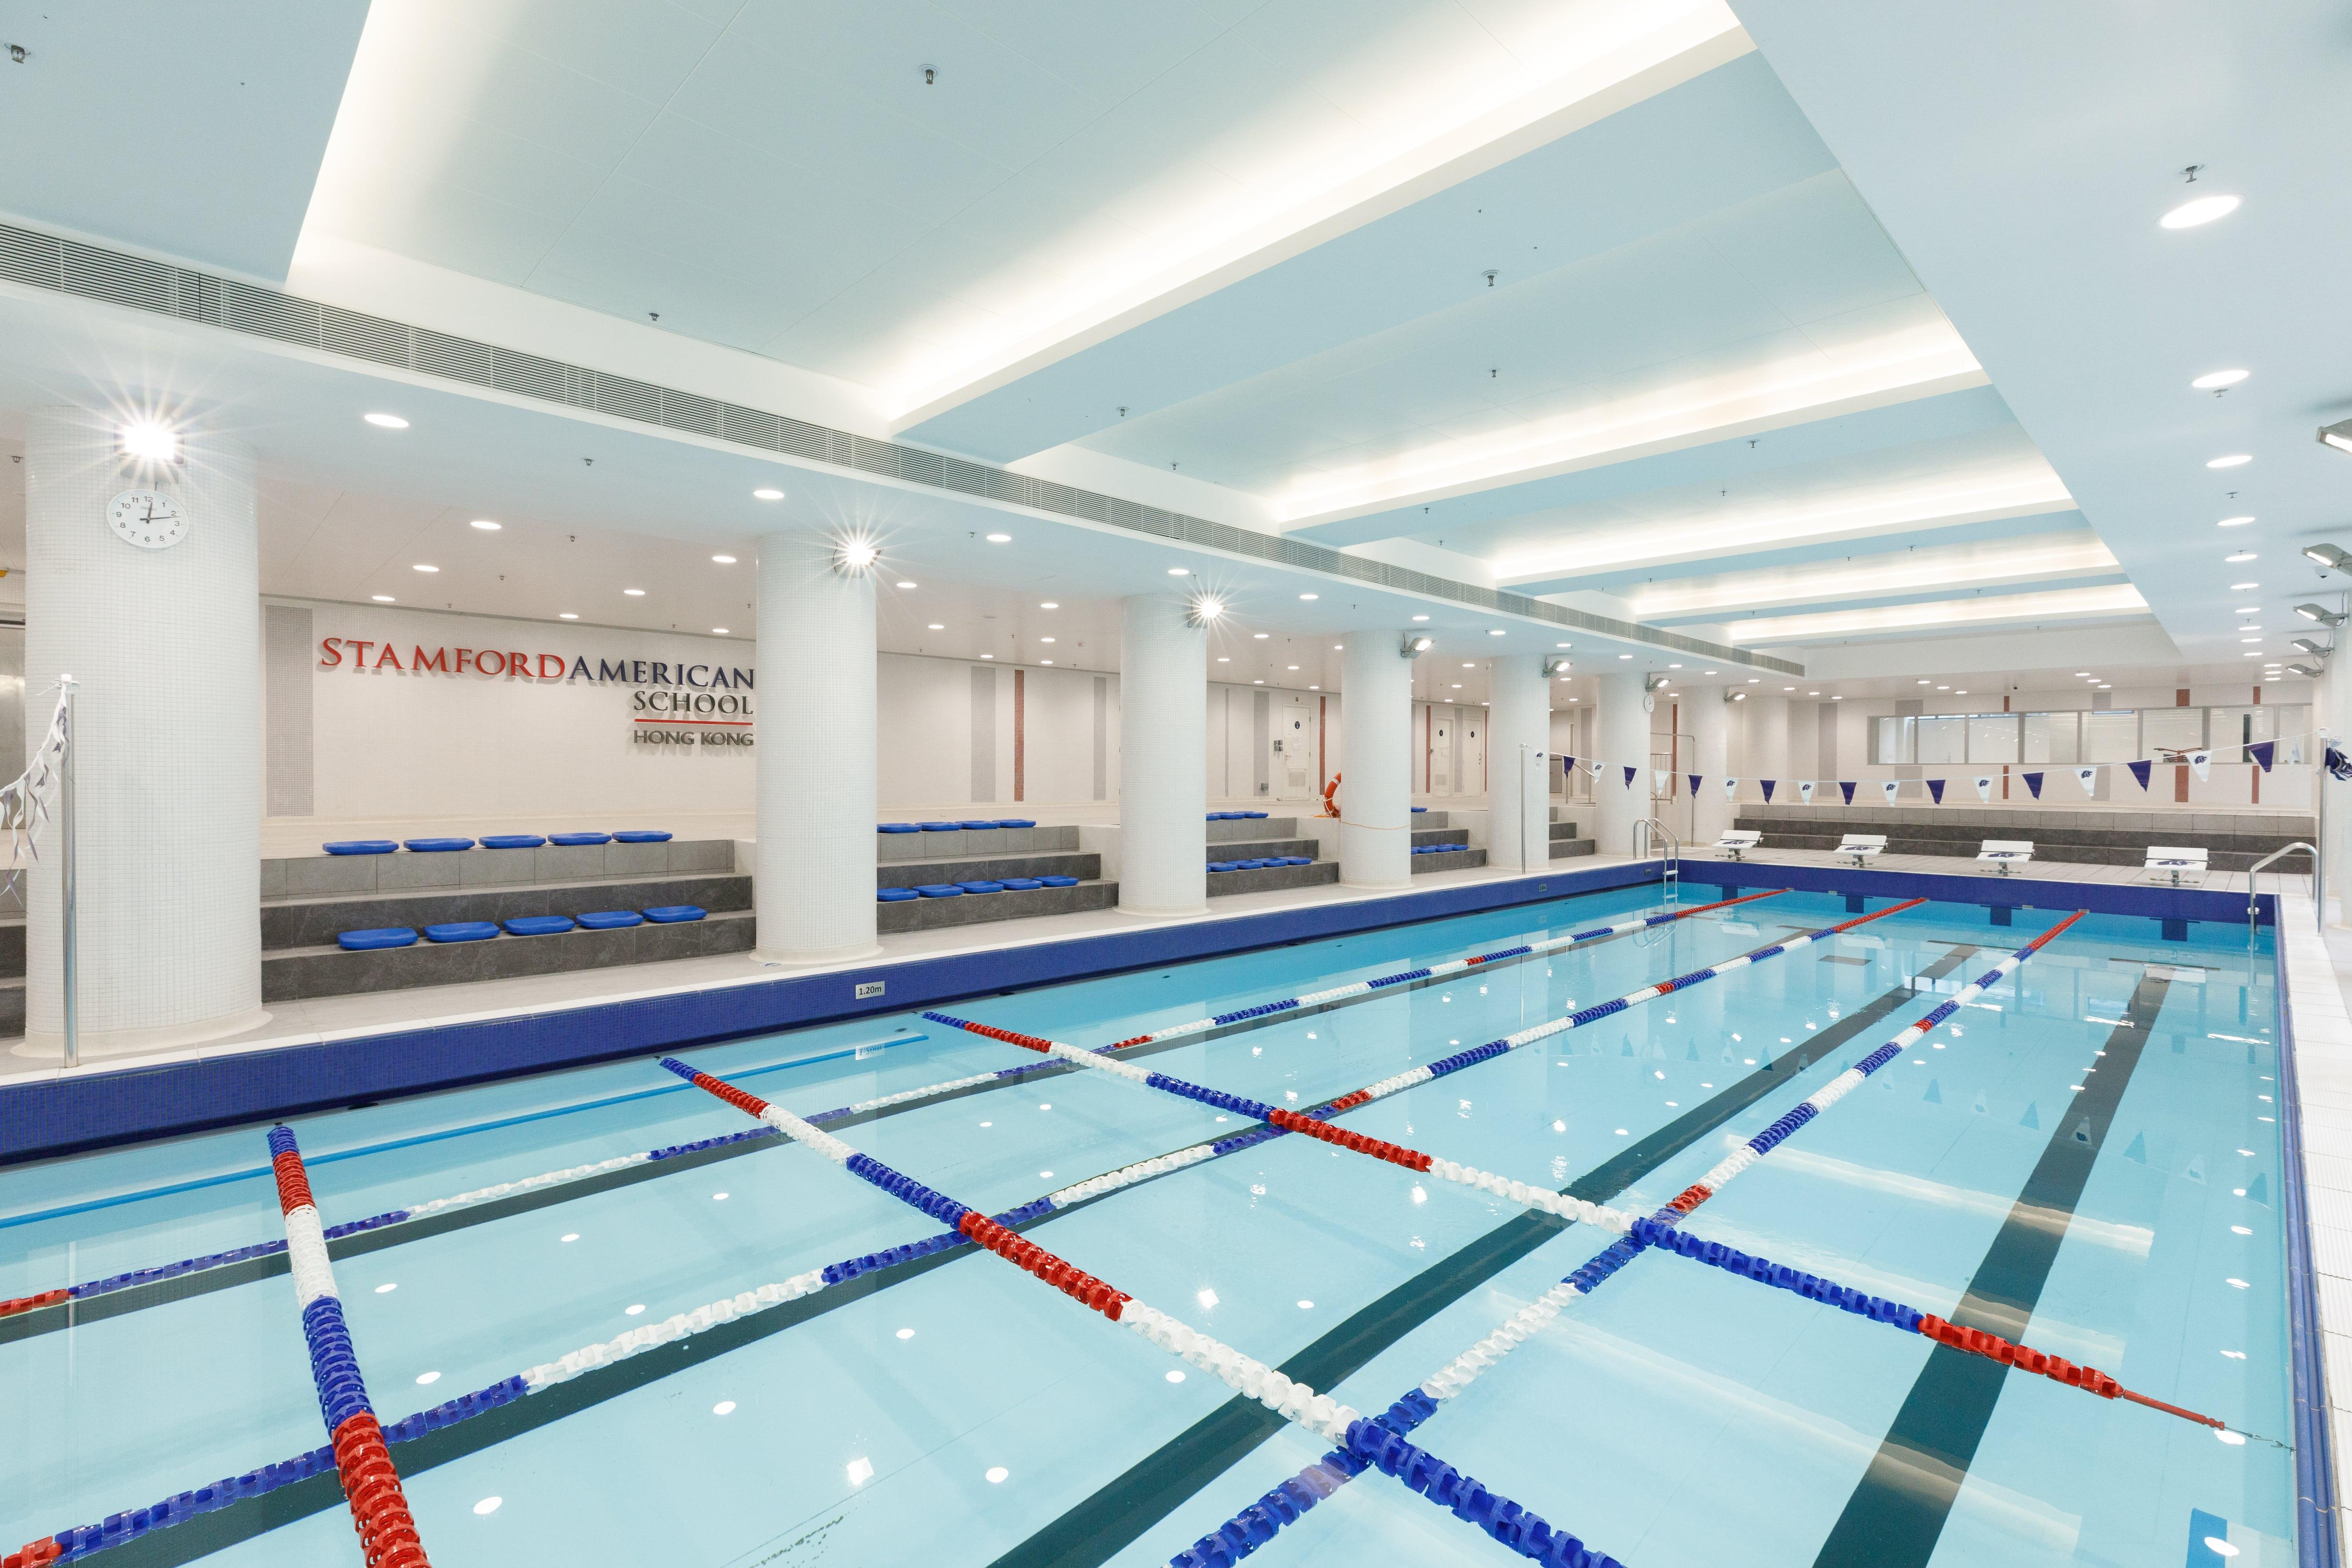 STAMFORD AMERICAN SCHOOL Swimming Pool